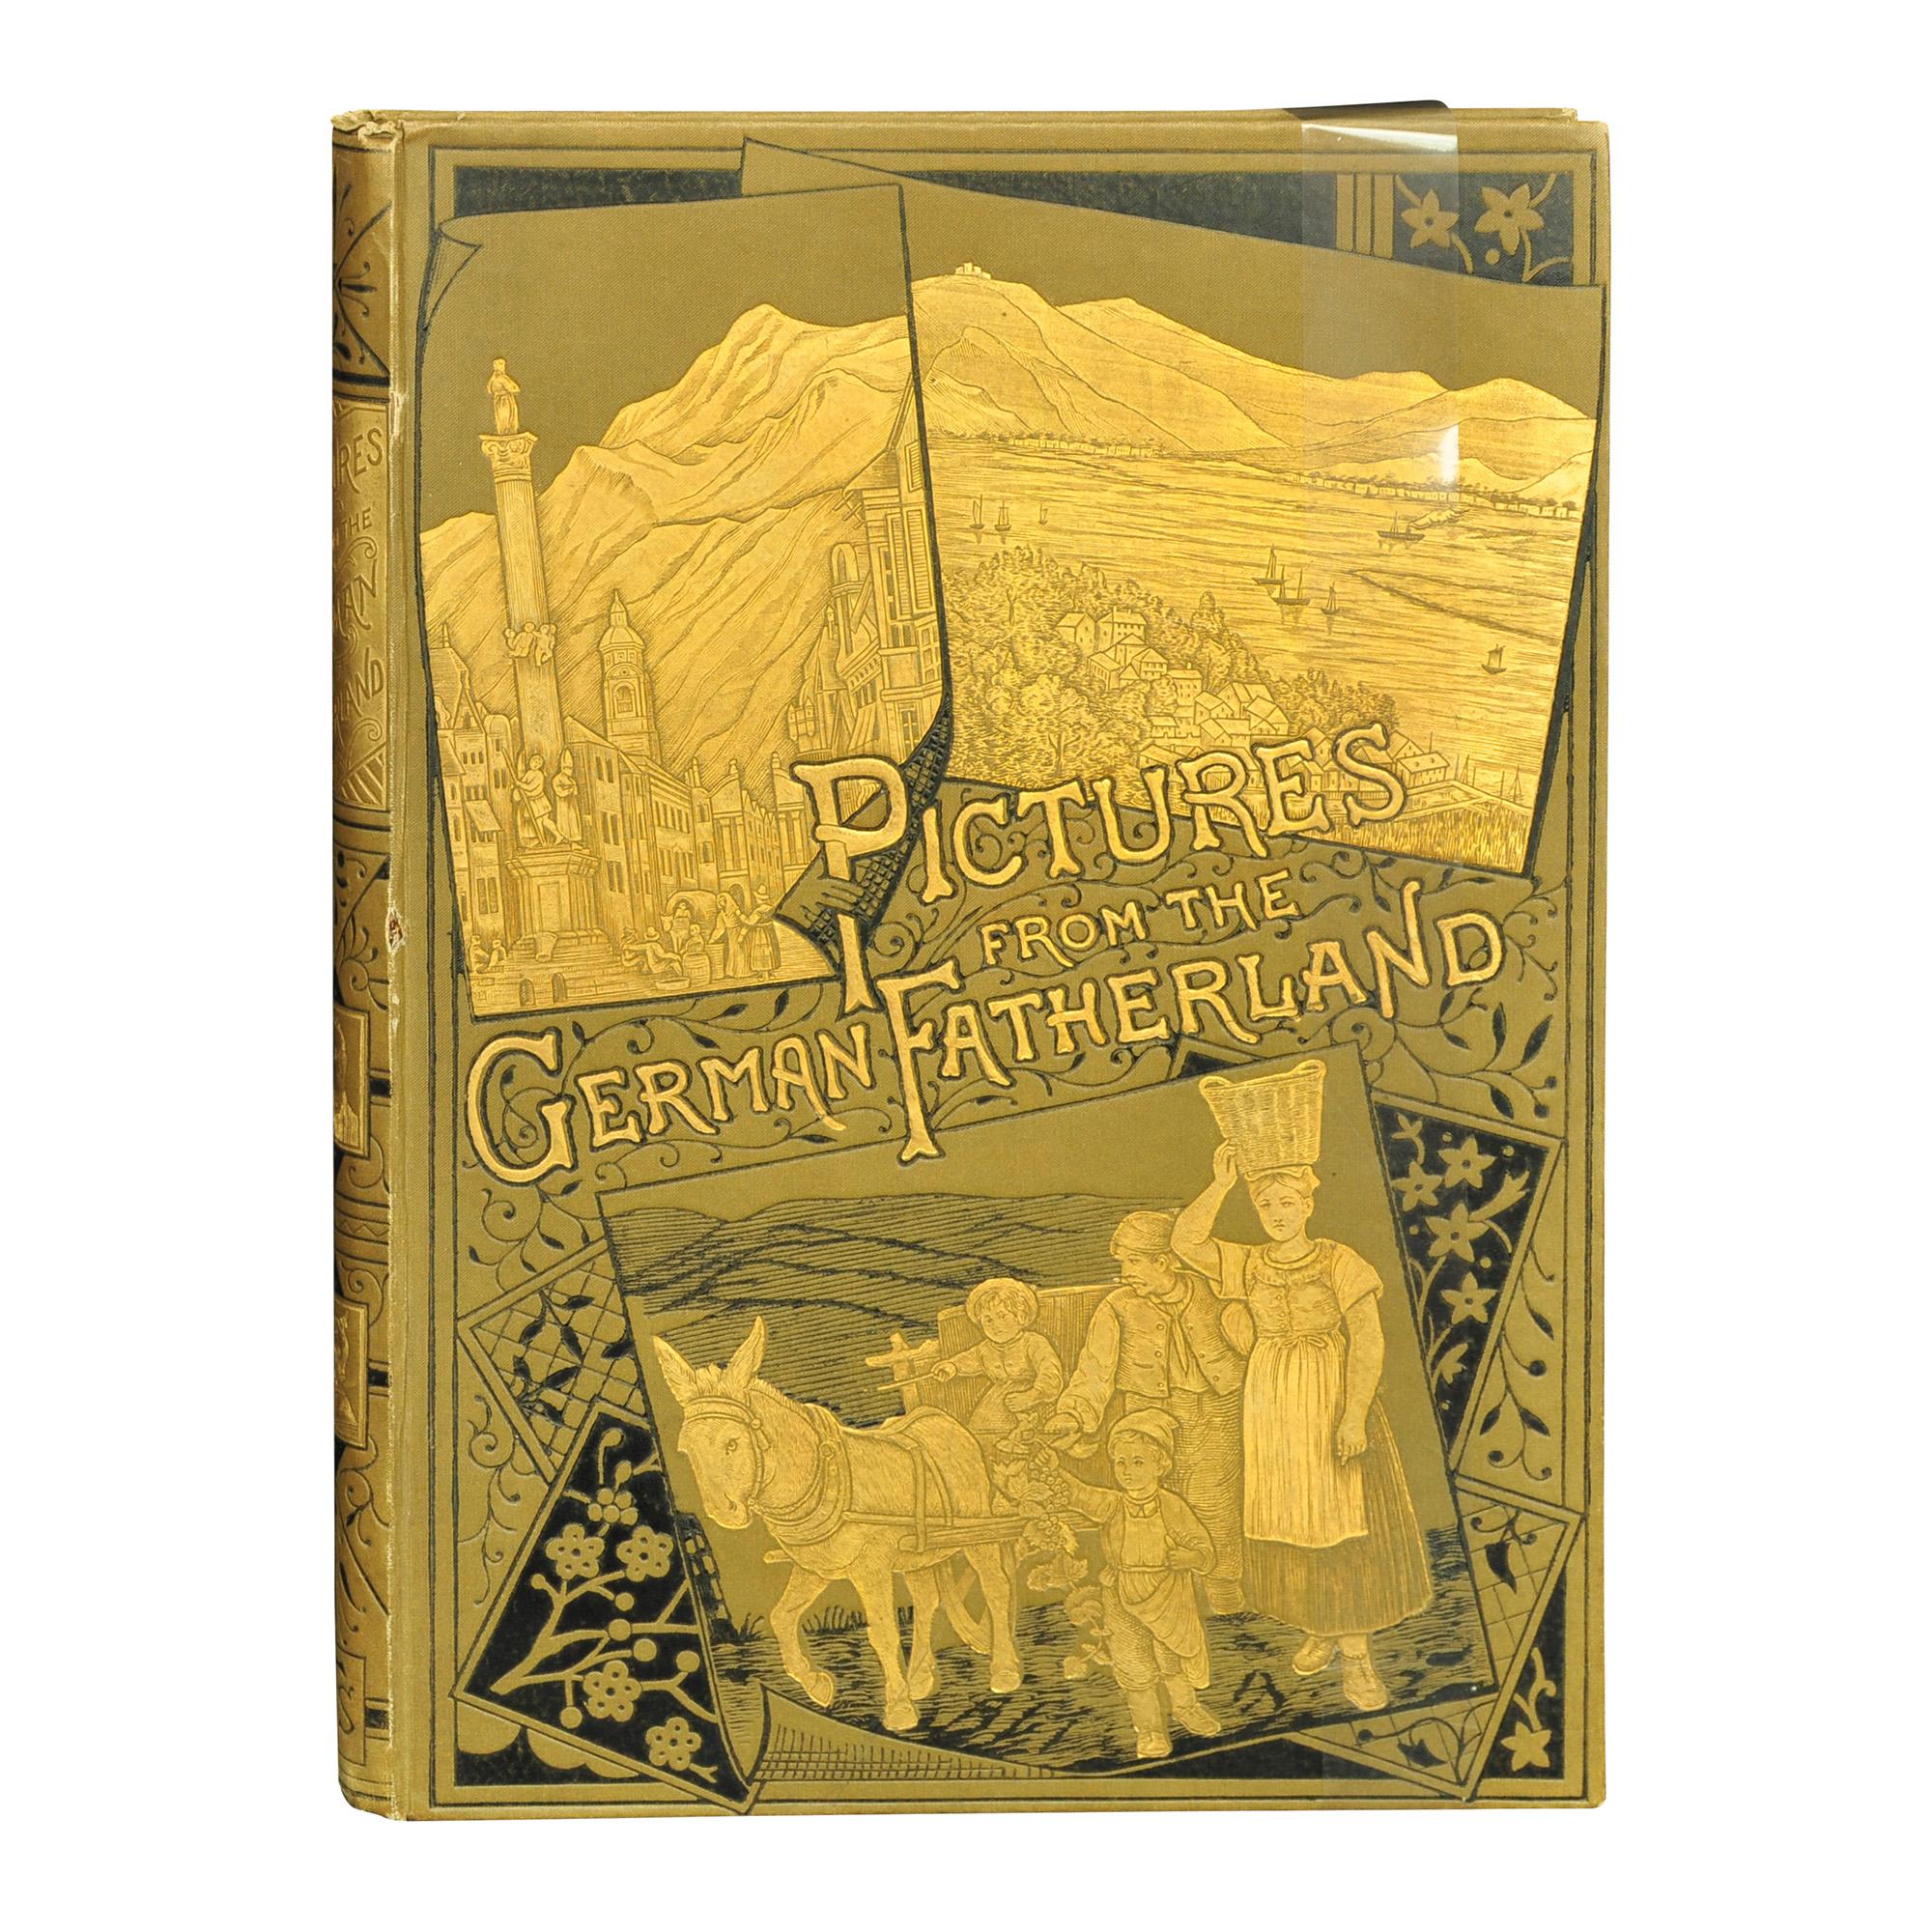 1146-Green-German-Fatherland-1880-1-frei.jpg